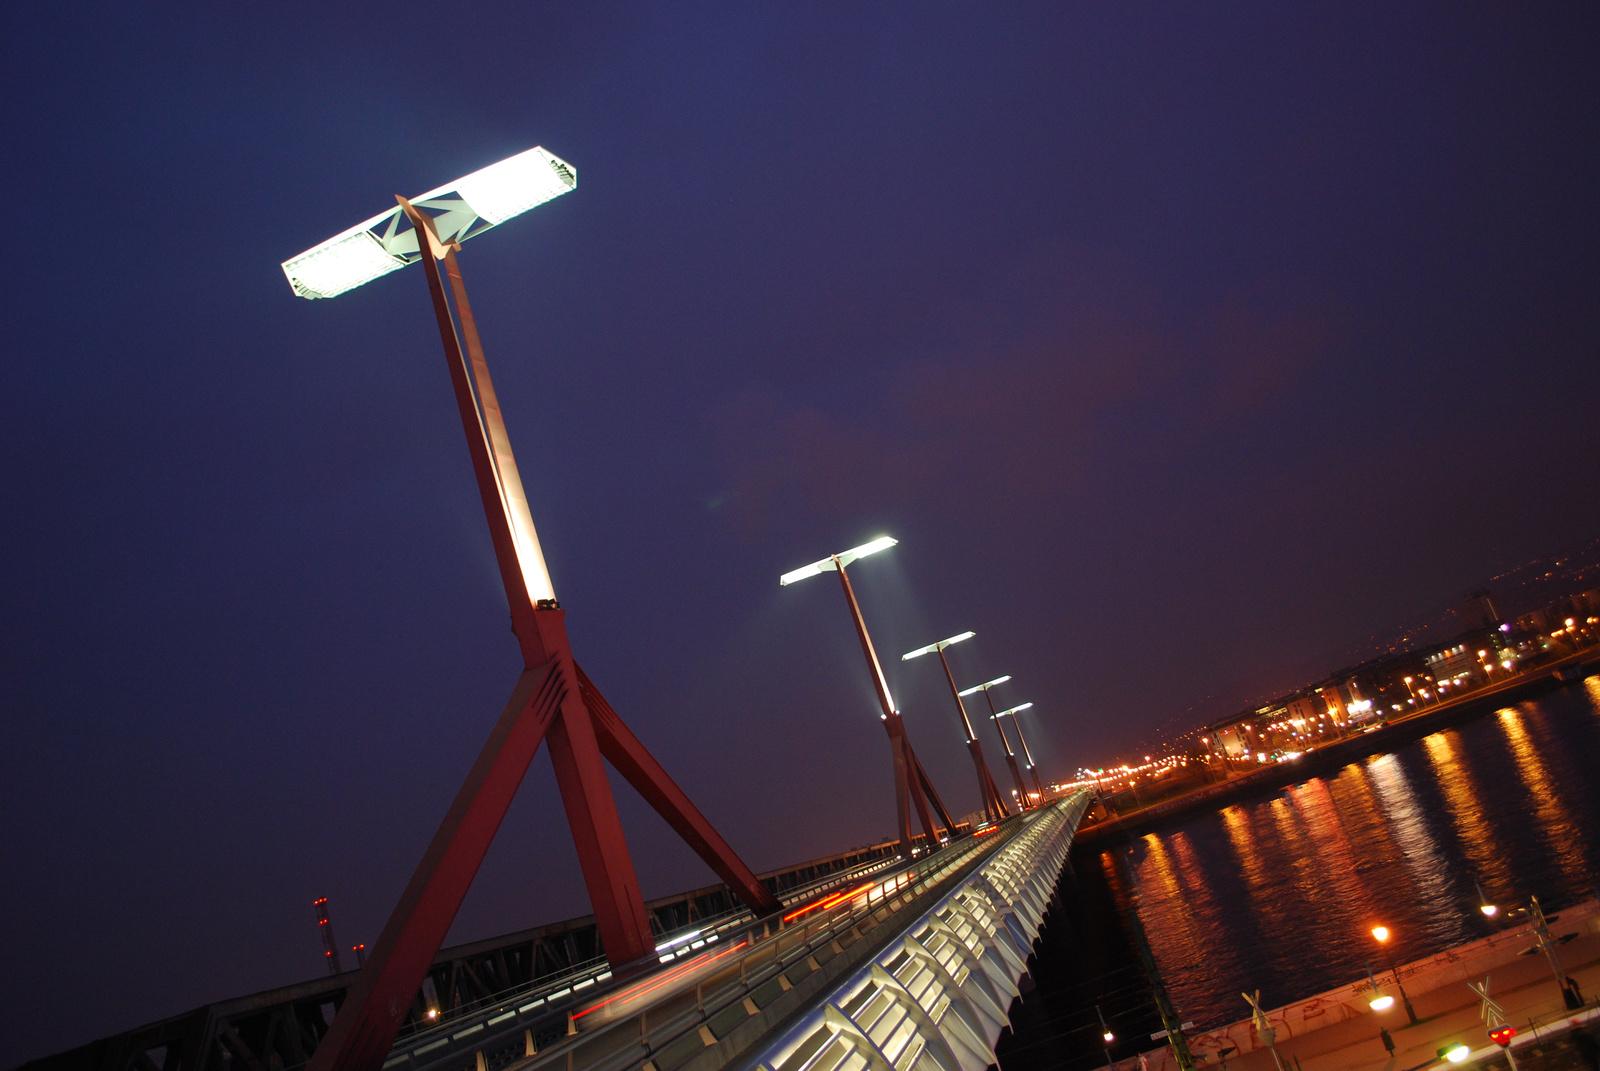 DSC 0767 Lágymányosi híd